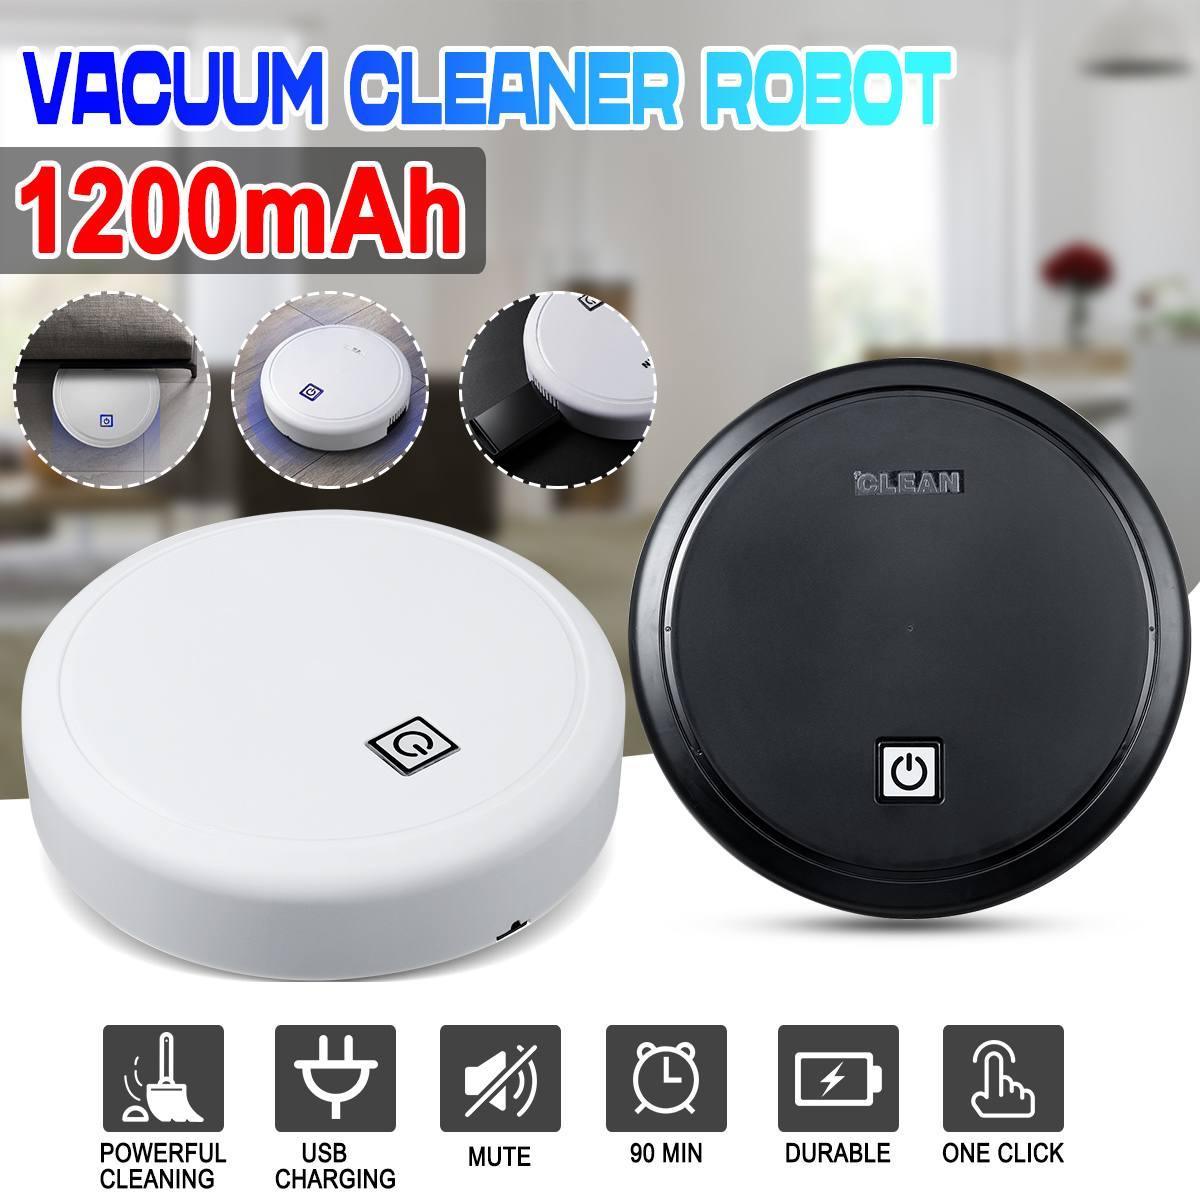 Robot aspirador inteligente recargable para Robot doméstico, máquina de arrastre de barrido y succión, Mini aspiradora de lavado, barrido en seco